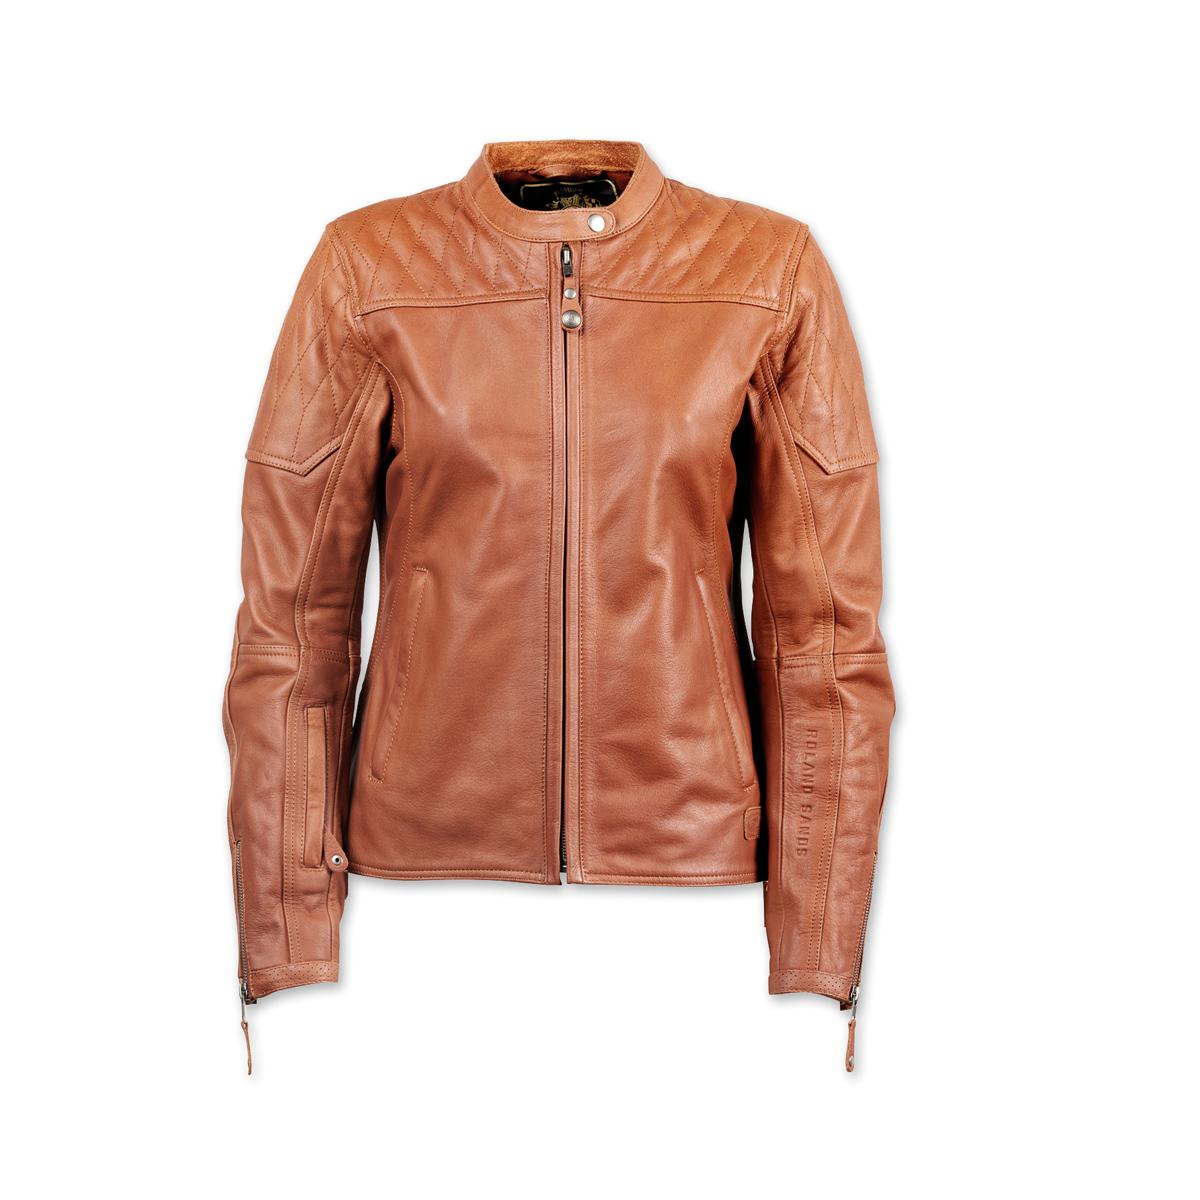 Roland Sands Design Women's Trinity Brown Leather Jacket